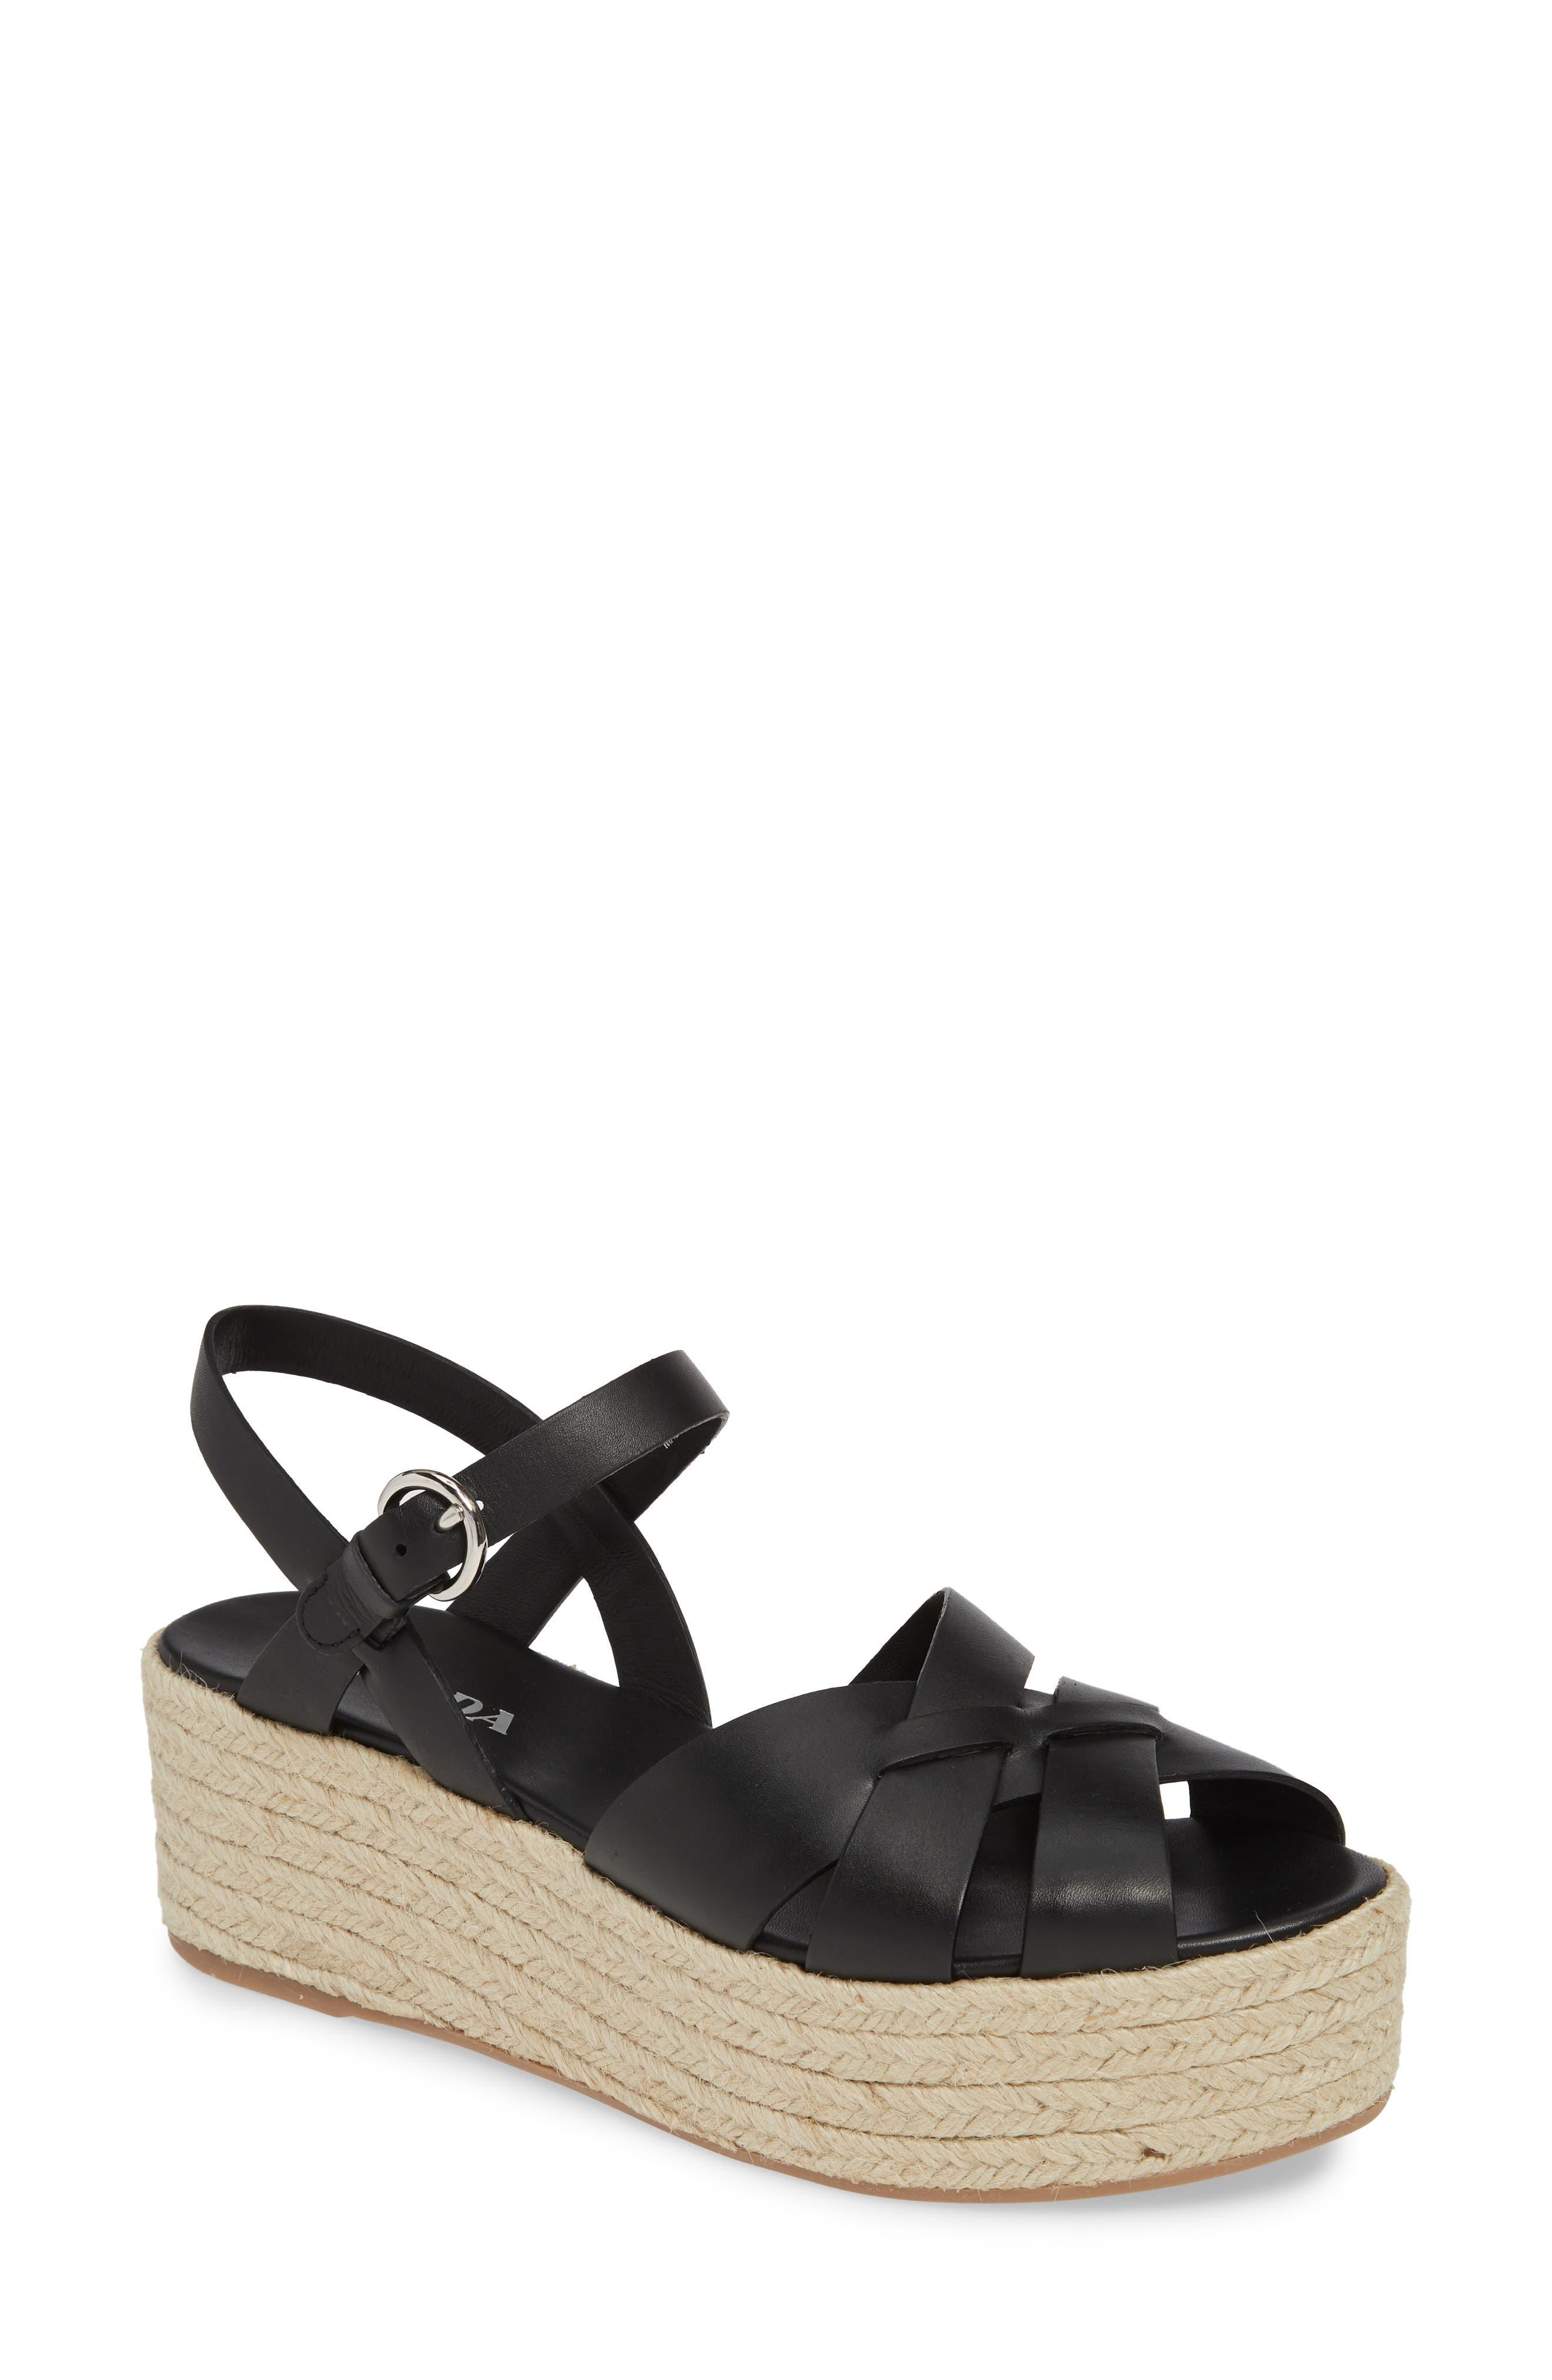 PRADA, Platform Espadrille Sandal, Main thumbnail 1, color, BLACK